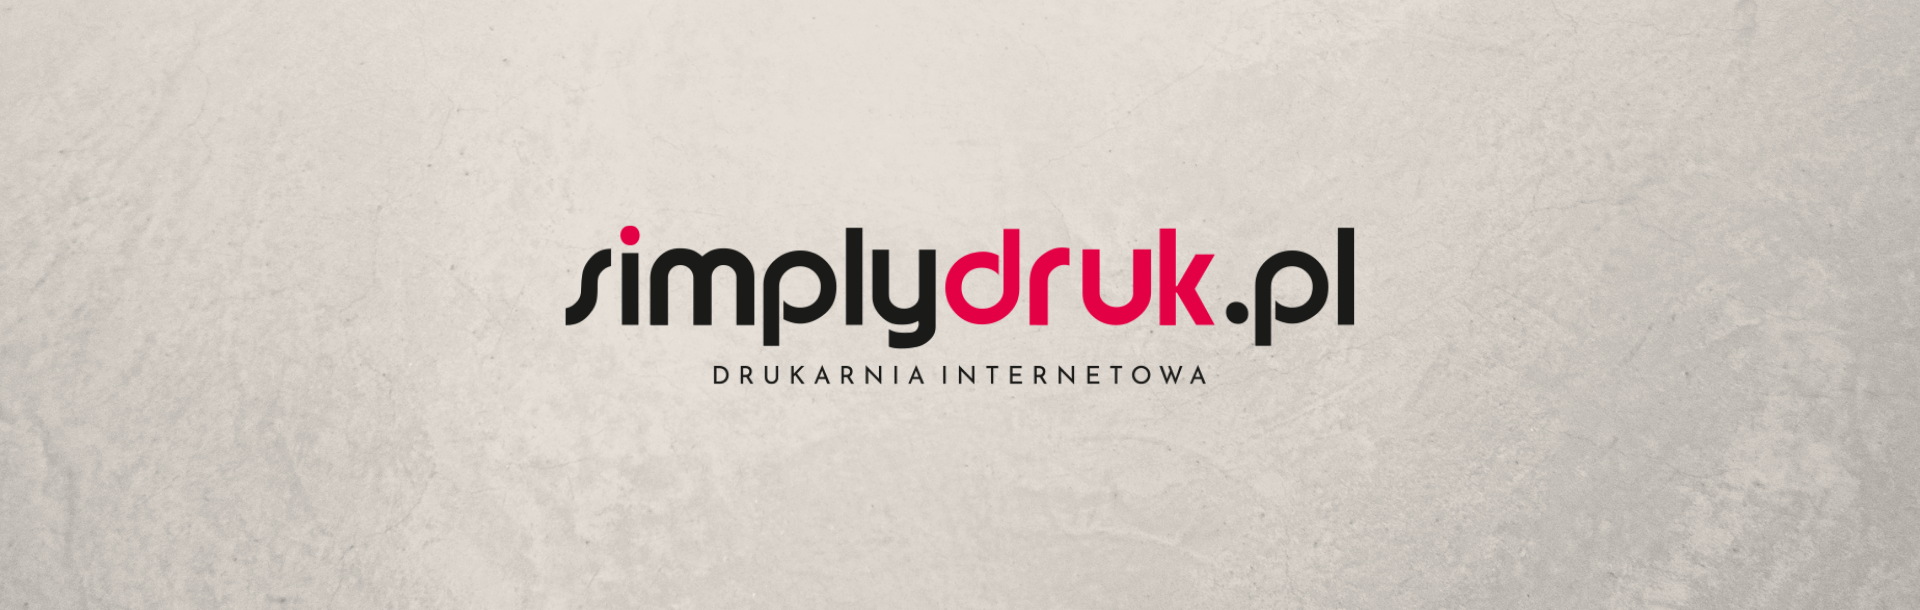 Blog drukarni simplydruk.pl